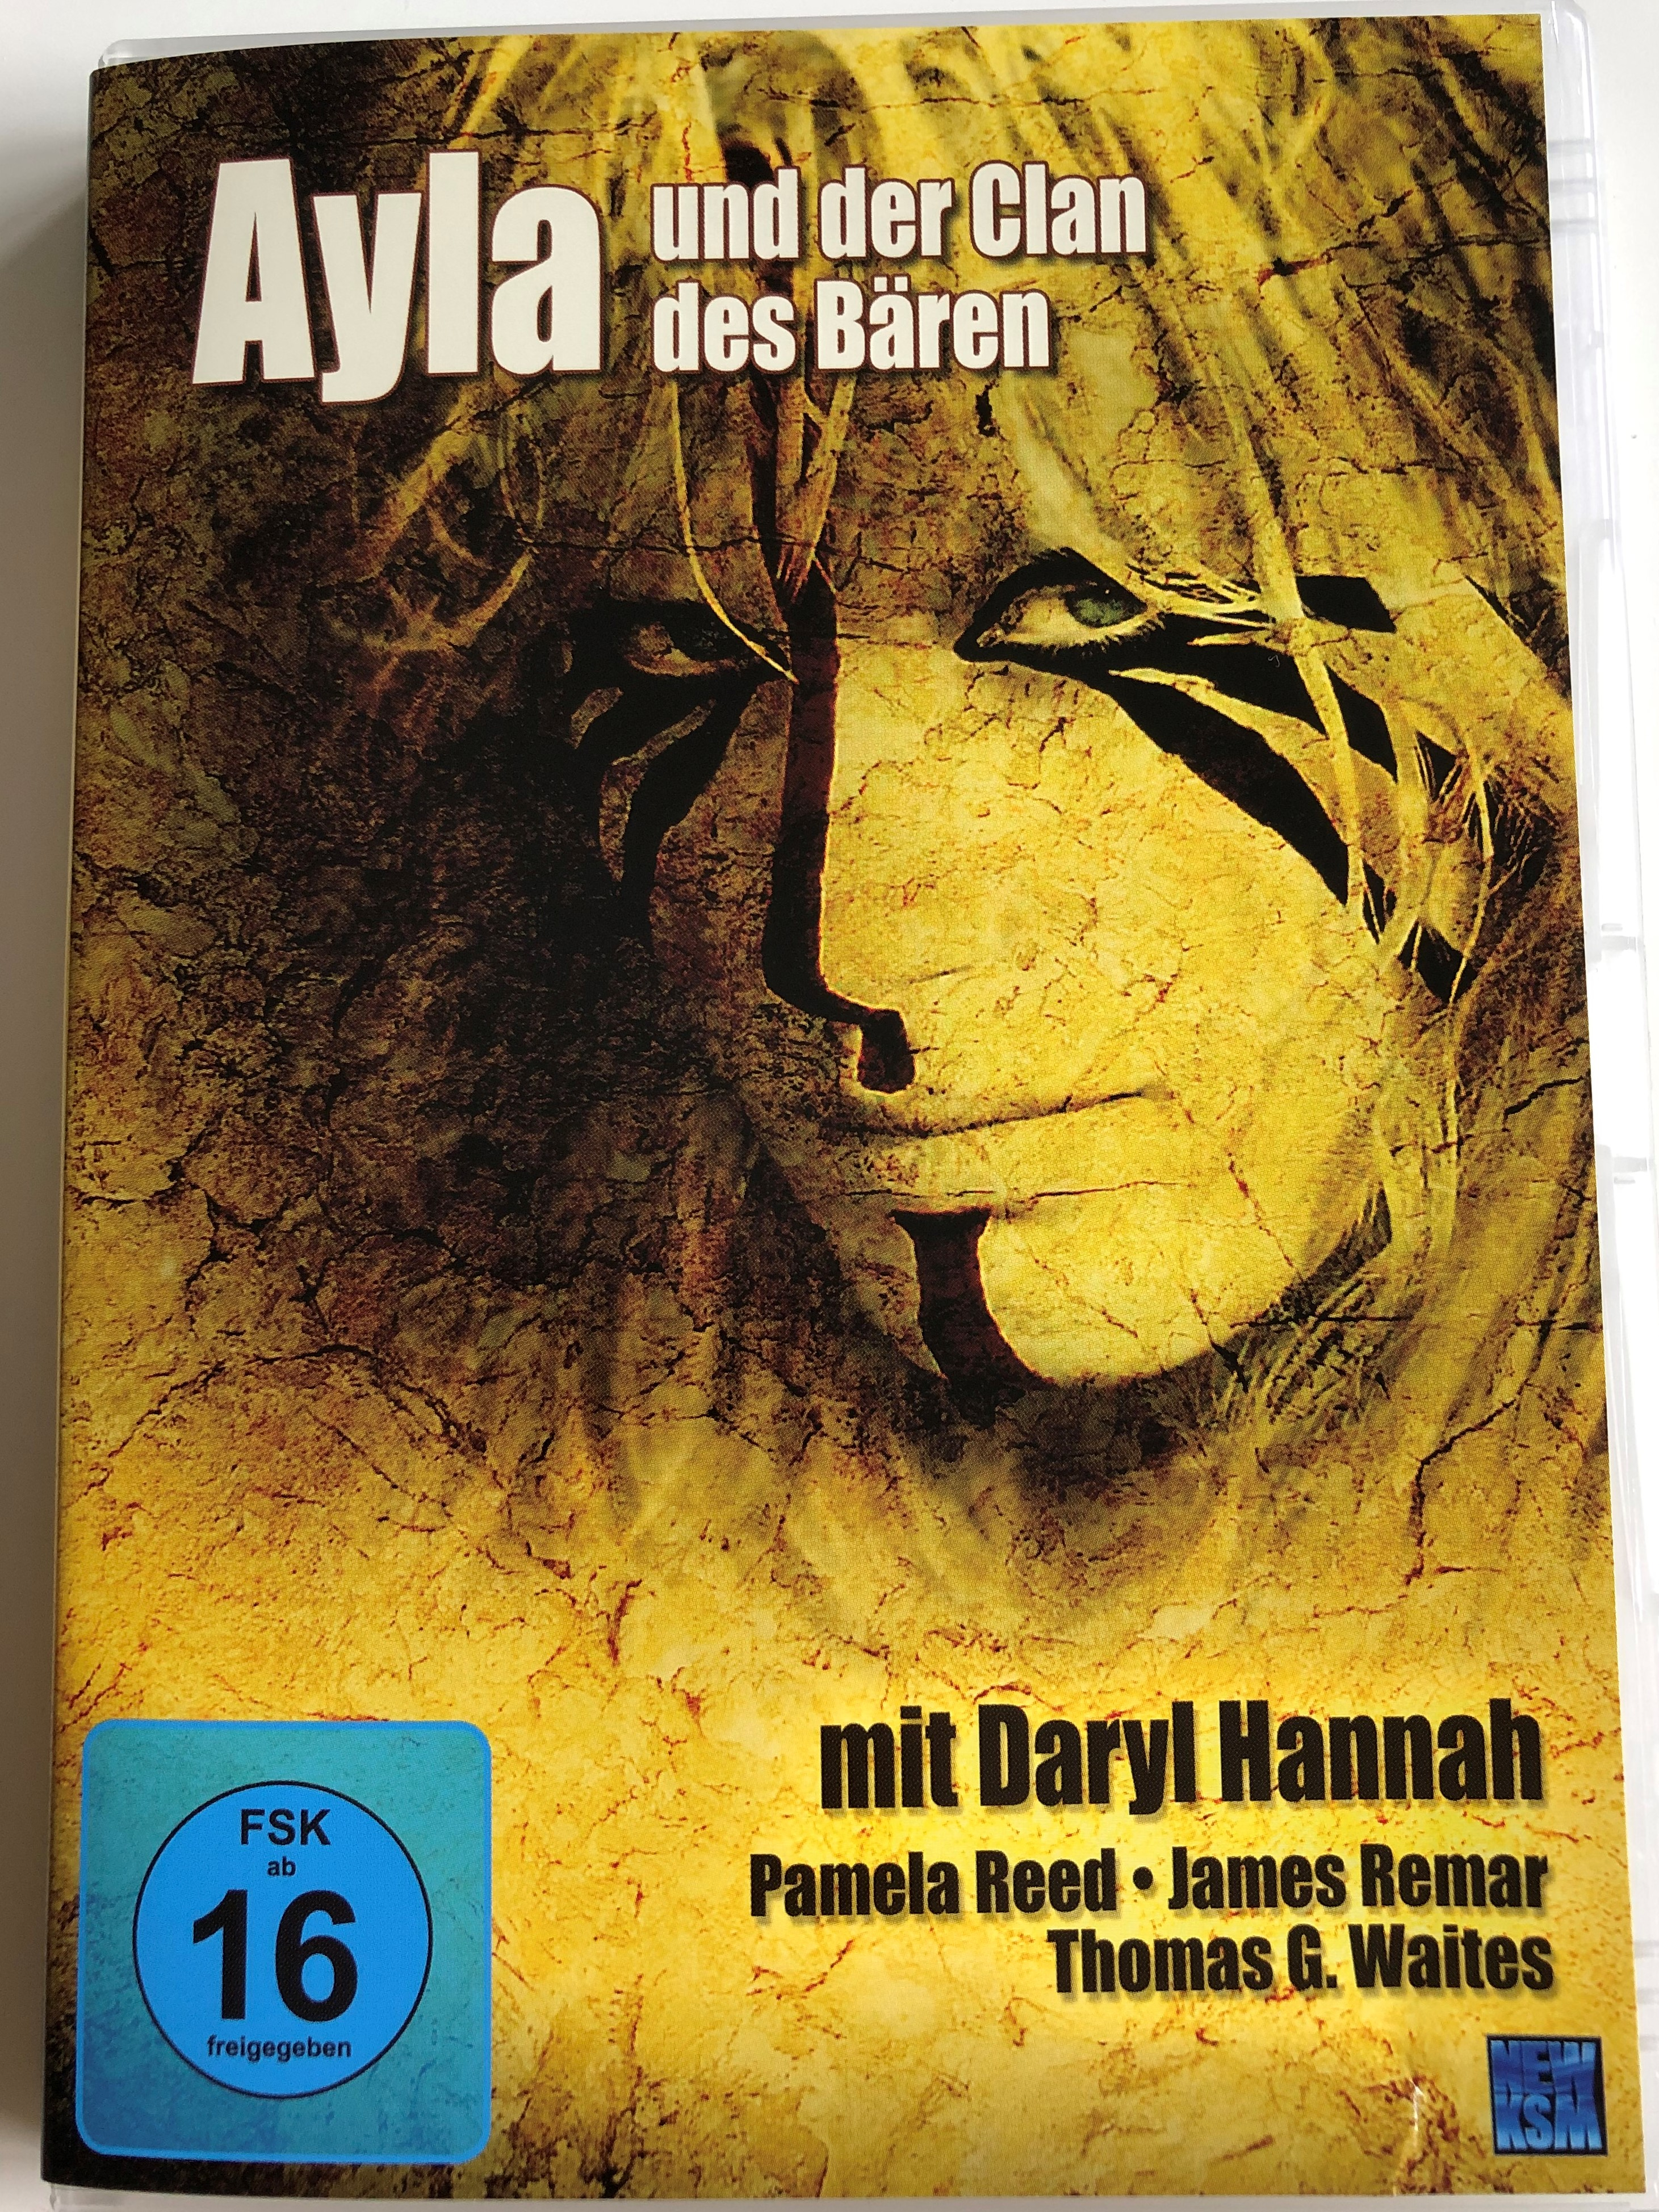 the-clan-of-the-cave-bear-dvd-1987-ayla-un-der-clan-des-b-ren-directed-by-michael-chapman-starring-daryl-hannah-pamela-reed-james-remar-thomas-waites-john-doolittle-1-.jpg